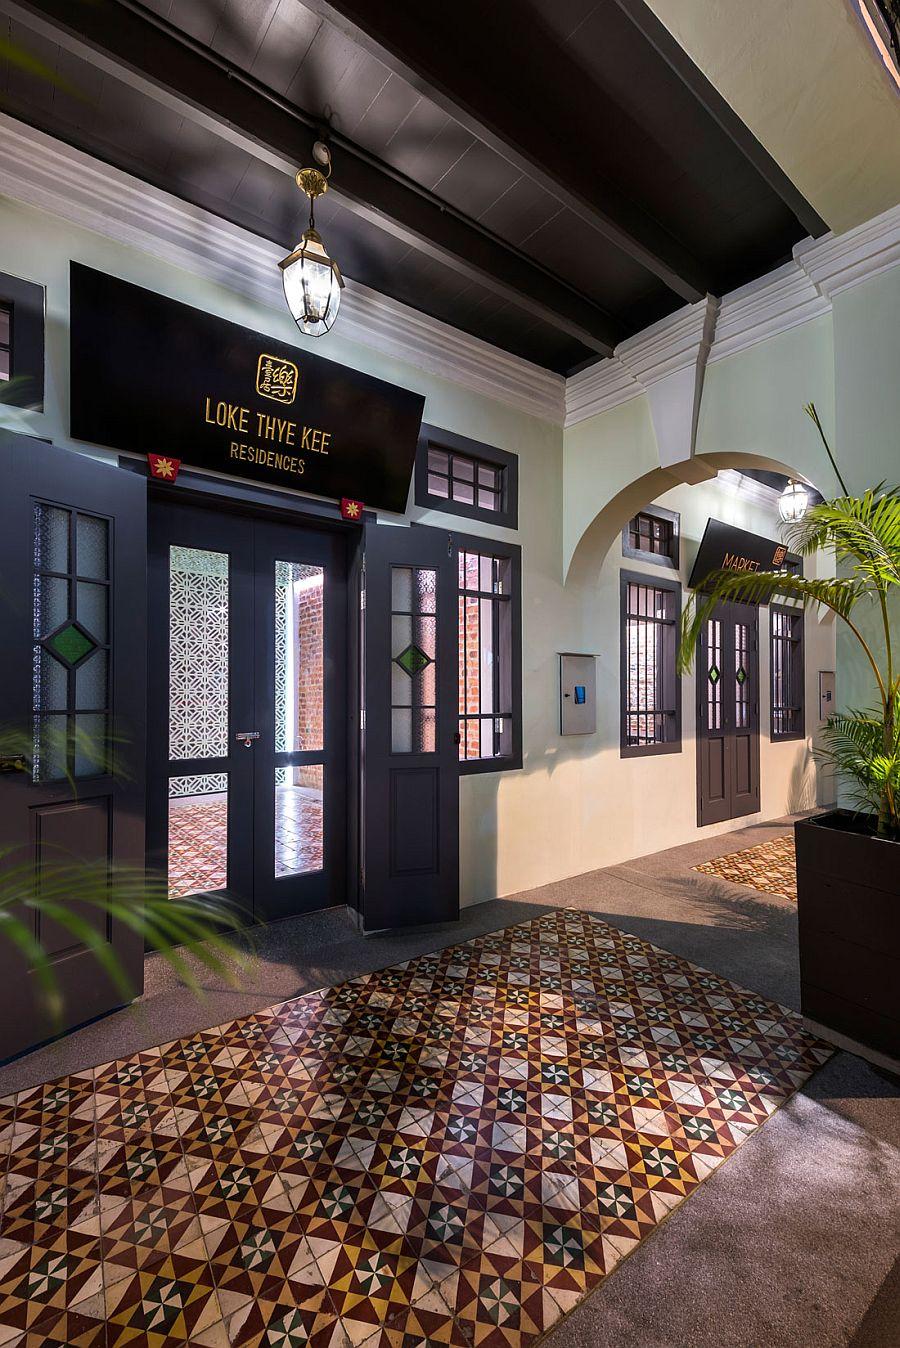 Loke Thye Kee Residences by by Ministry of Design in Georgetown, Penang